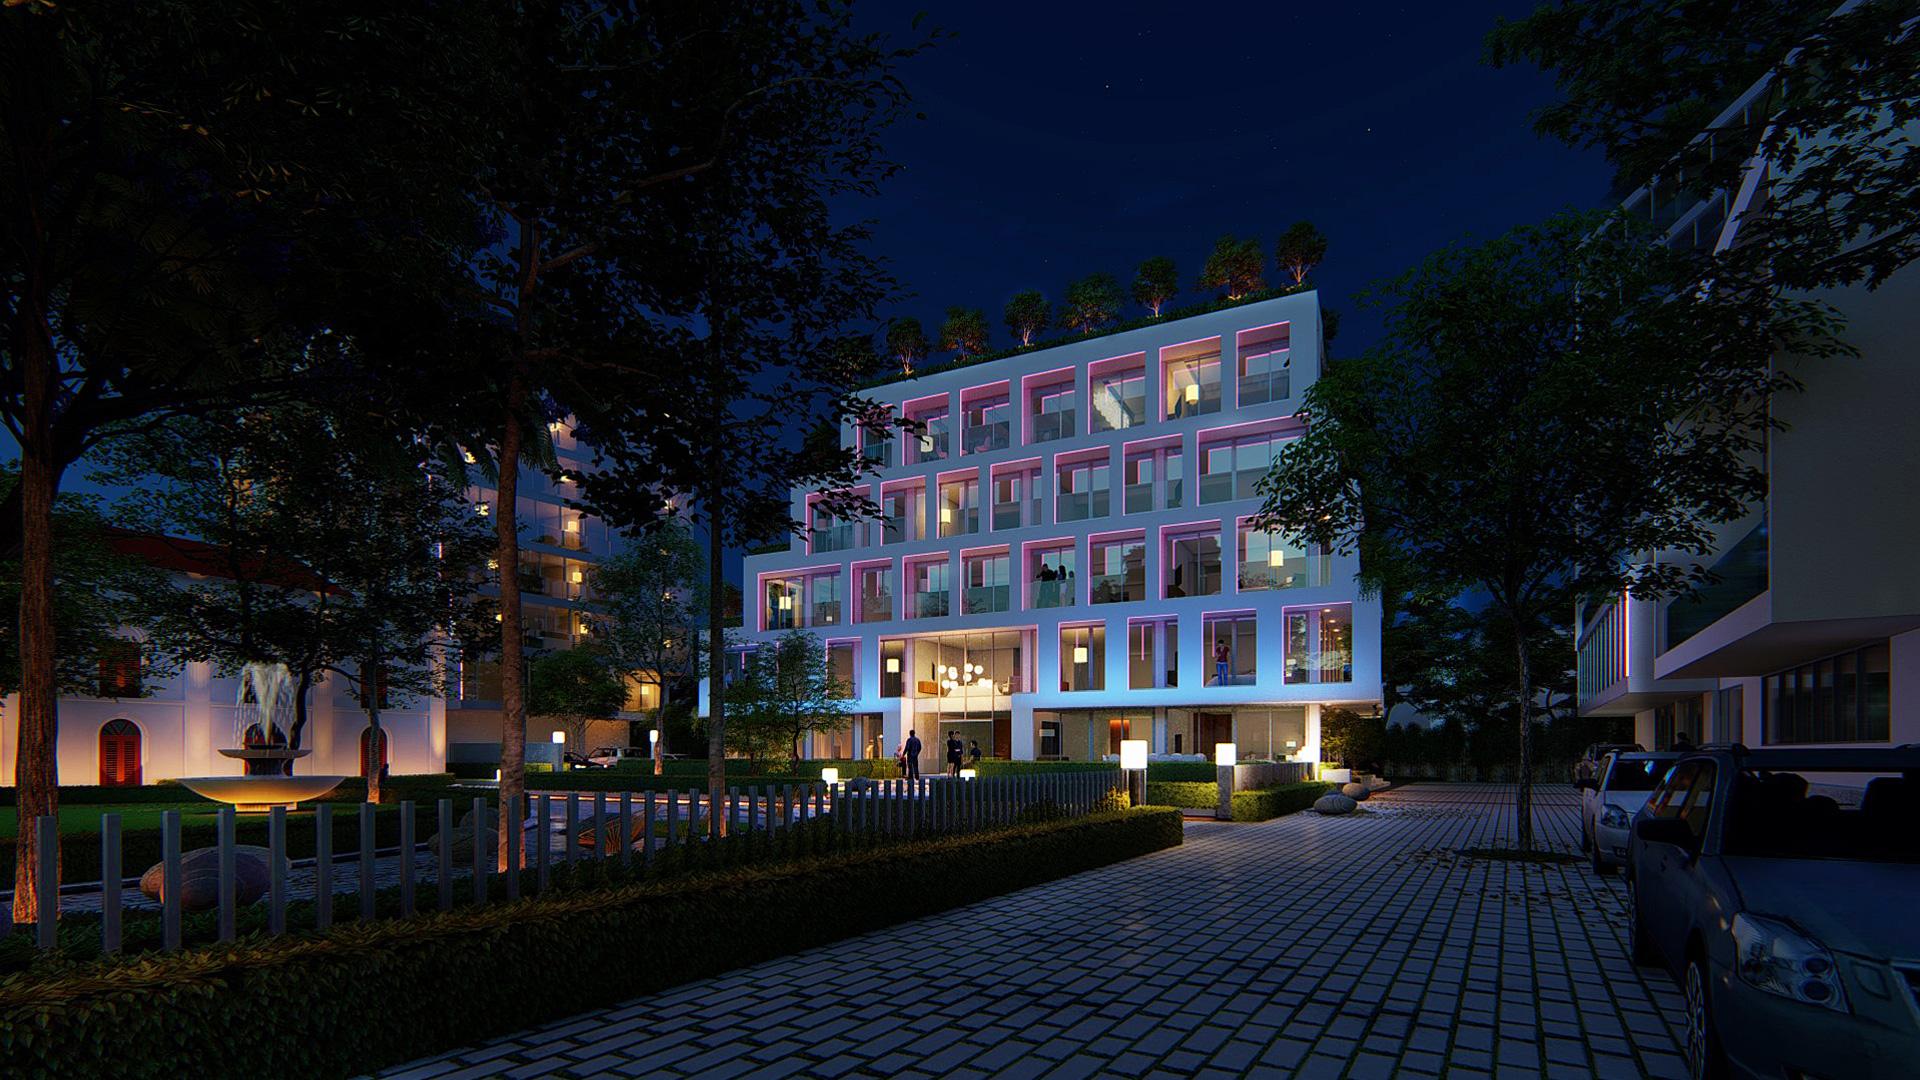 MAP_Design_Architecture_Residential_Architect_Kiran_Mathema_lighting_Green_Facade